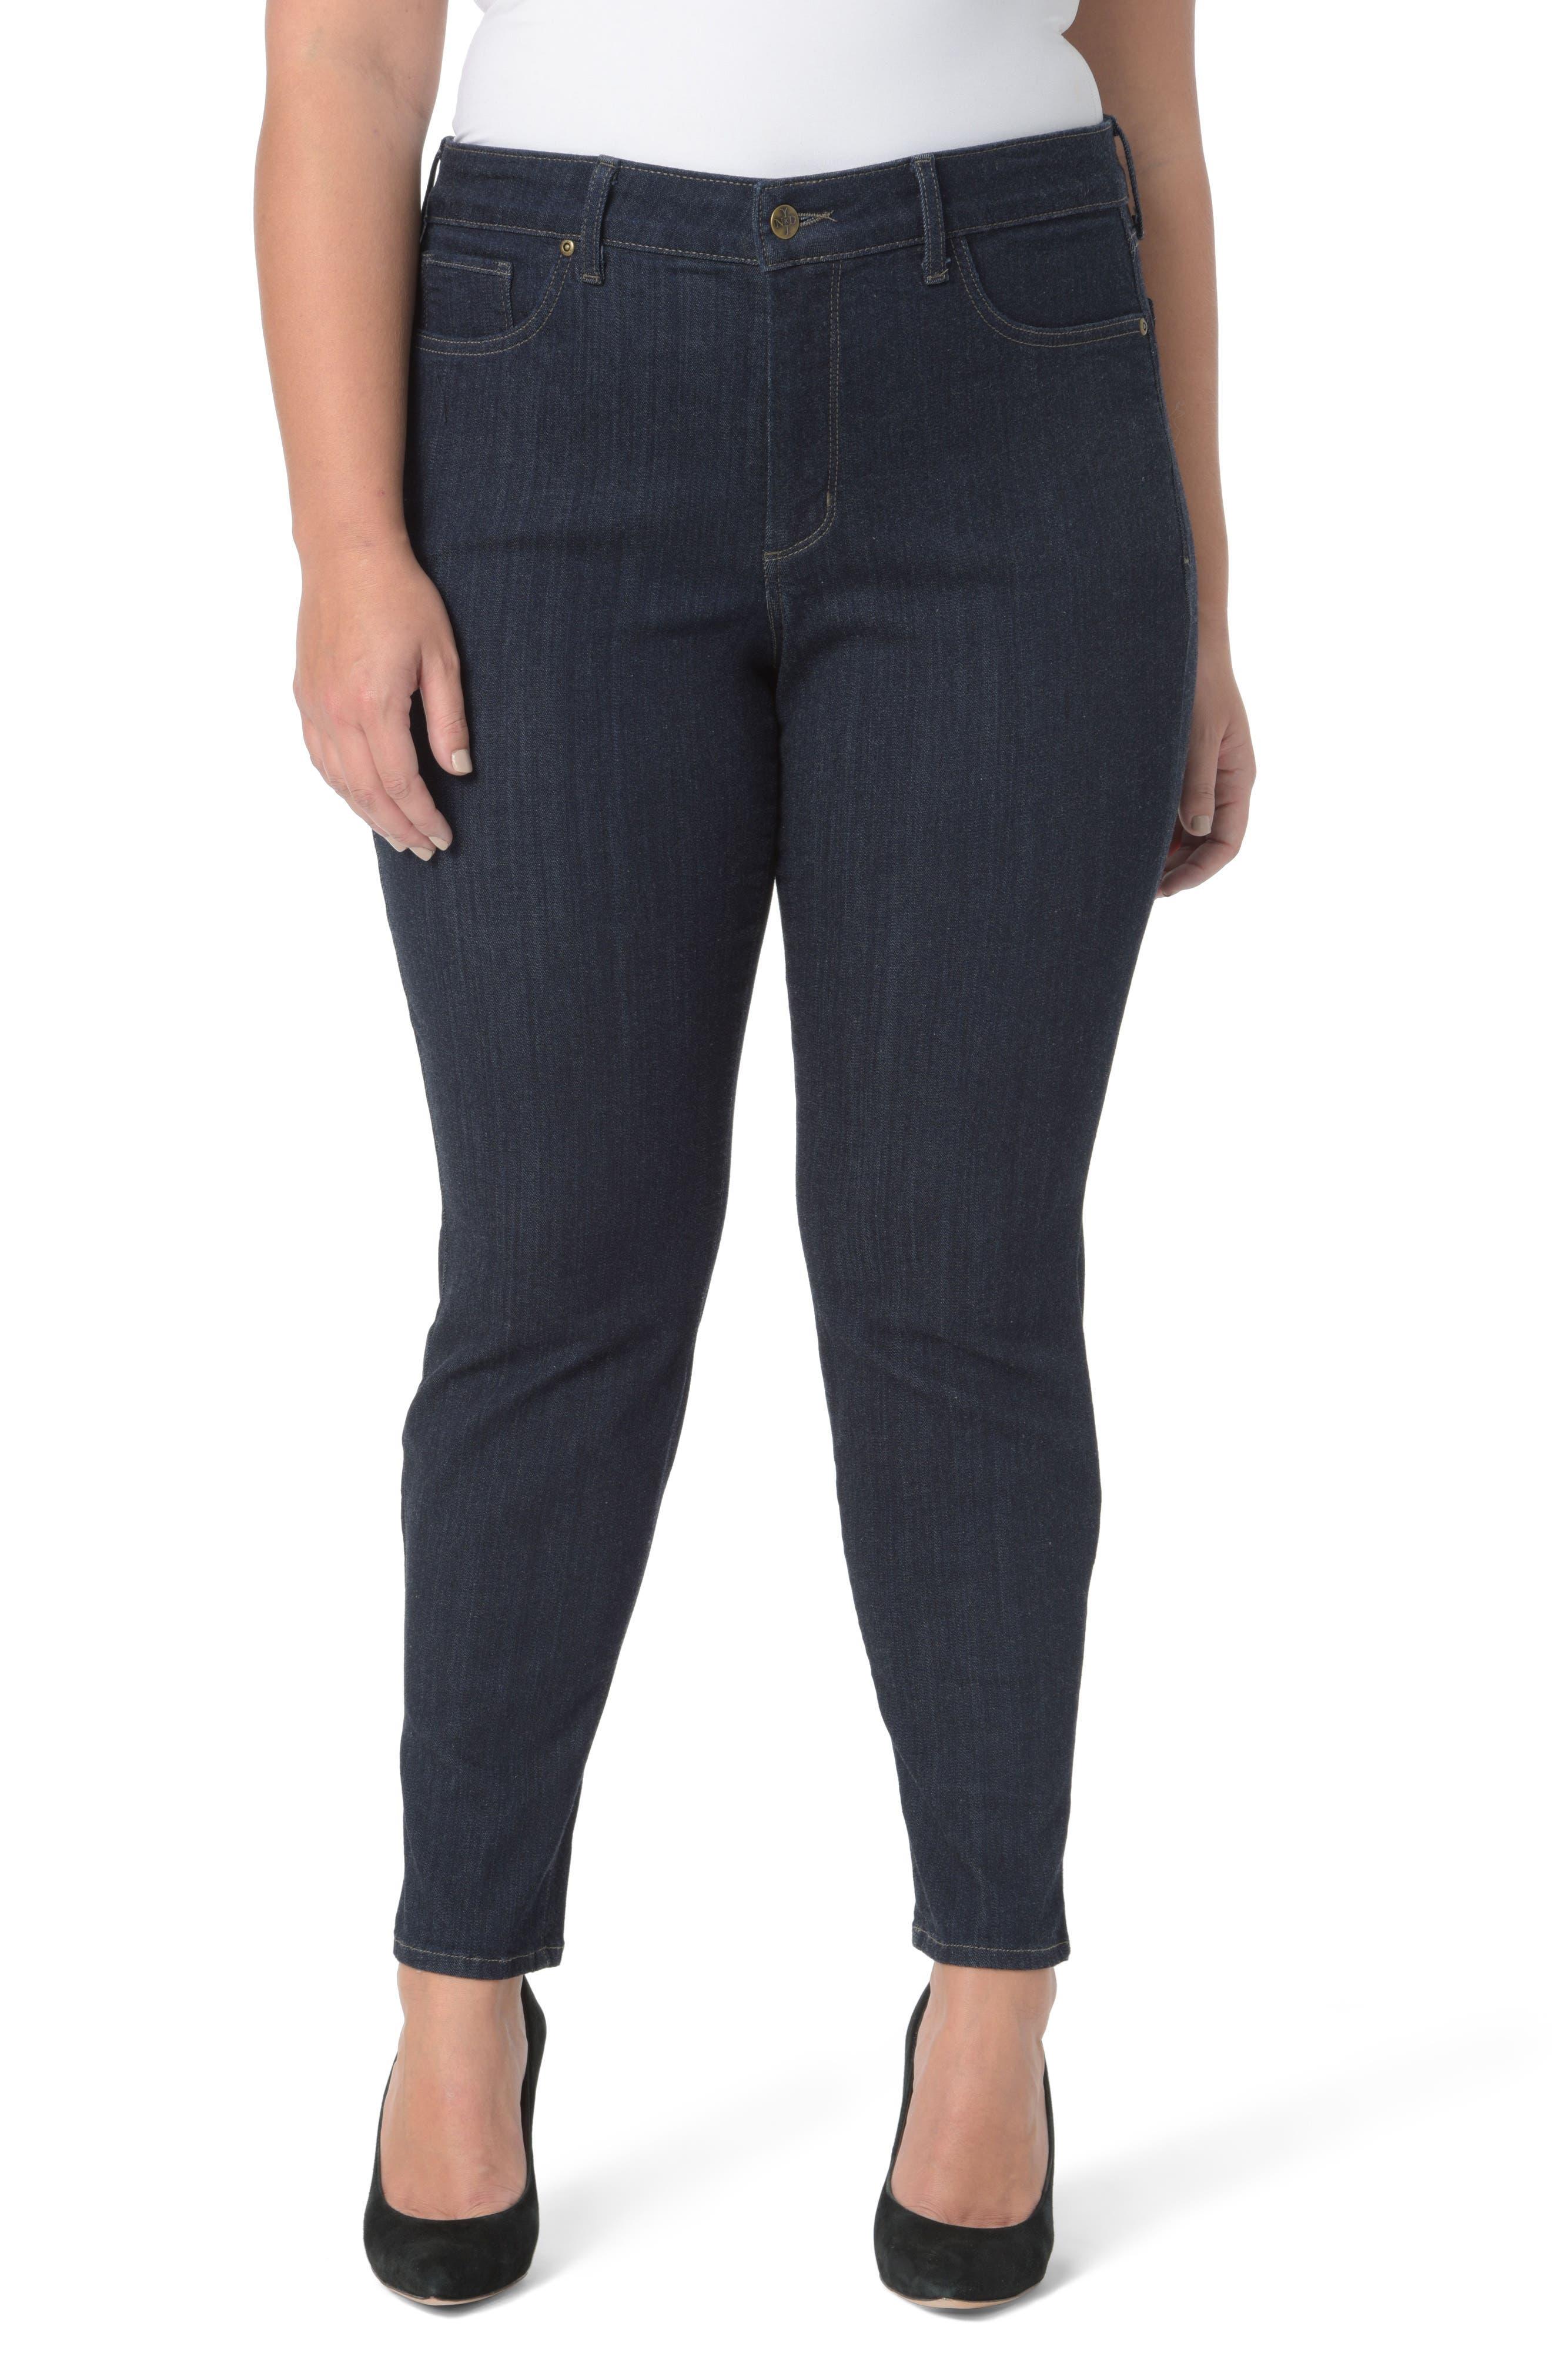 Ami Skinny Legging Jeans,                             Main thumbnail 1, color,                             464